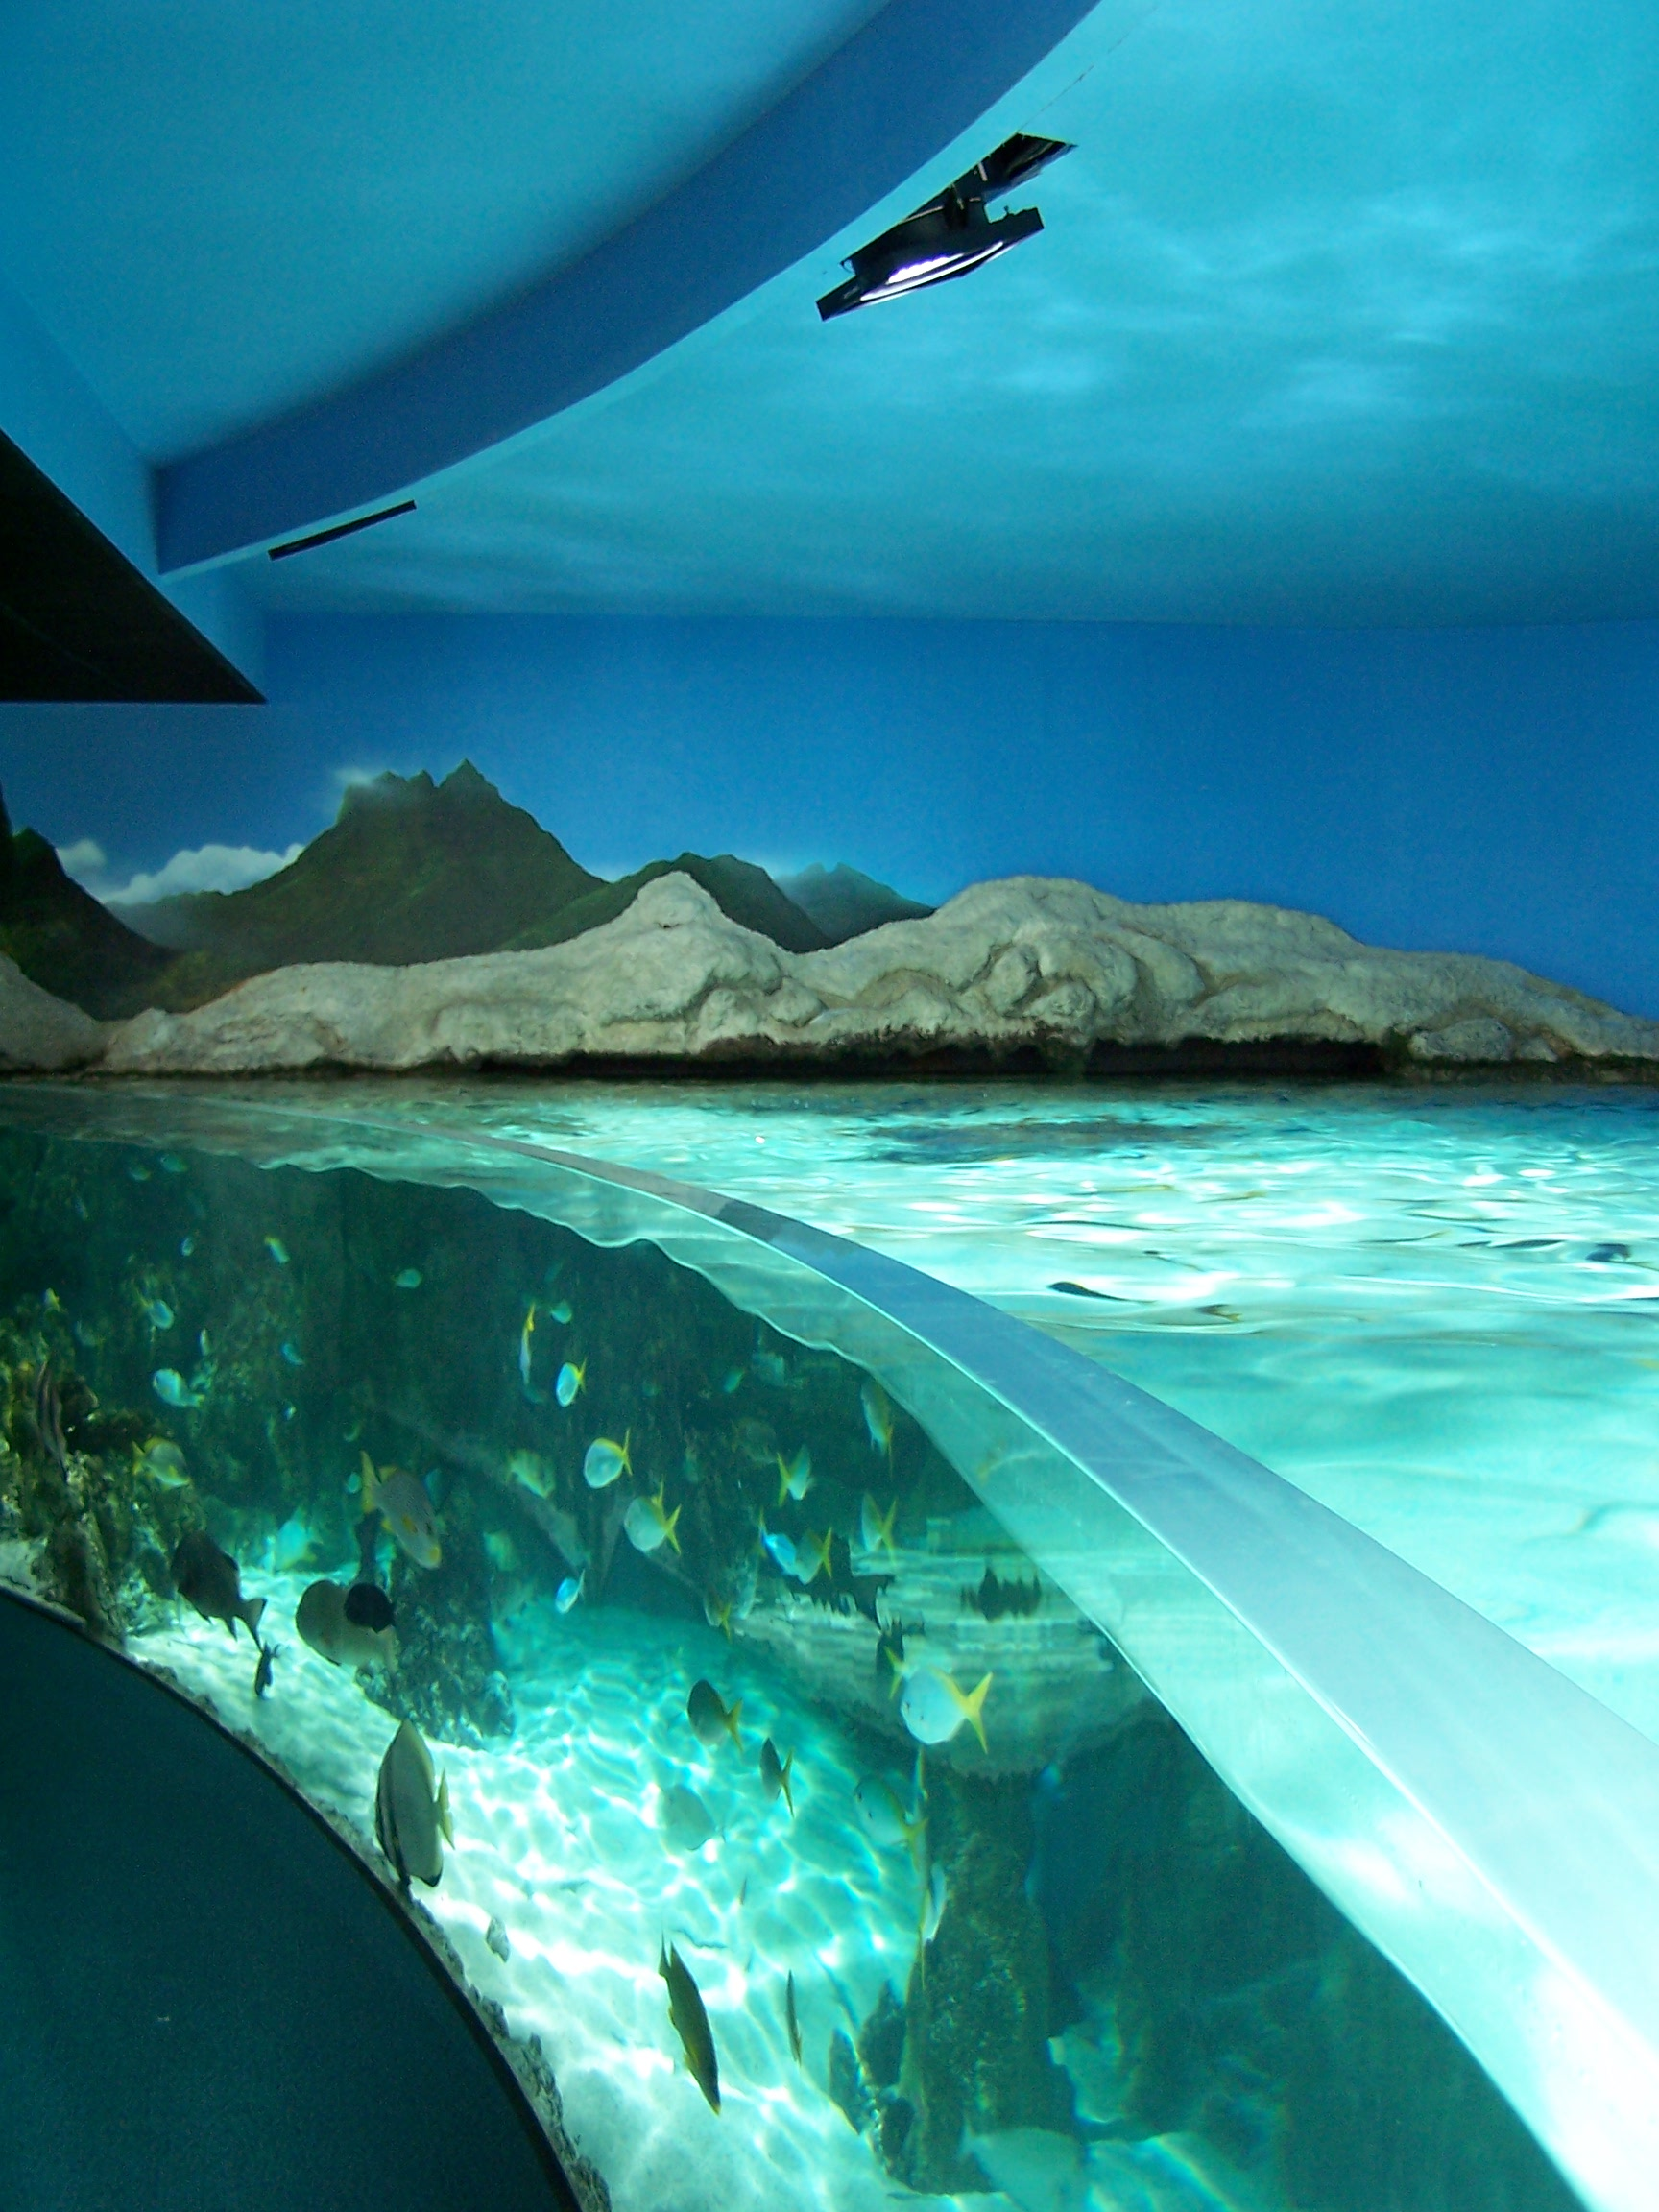 File:Aquarium de La Rochelle - Bassins 005.jpg - Wikimedia Commons